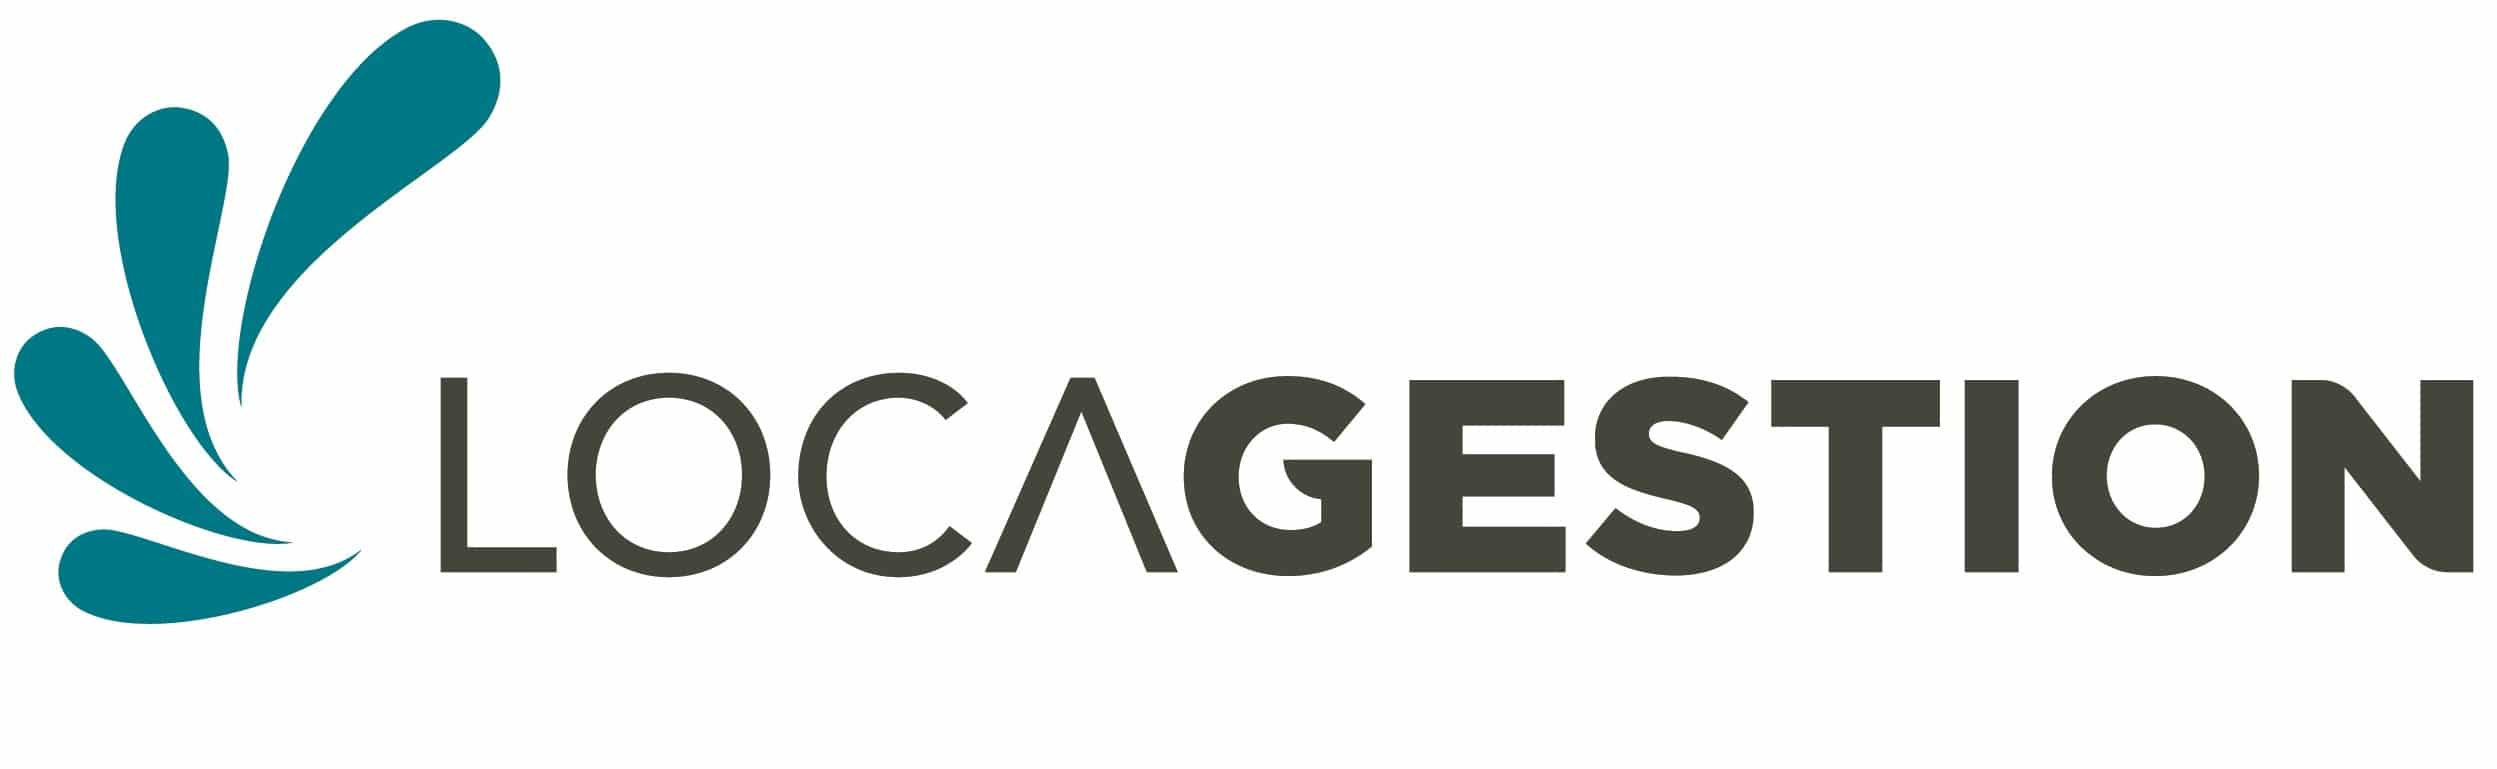 Locagestion logo - agence immobiliere - GMAO Bob Desk